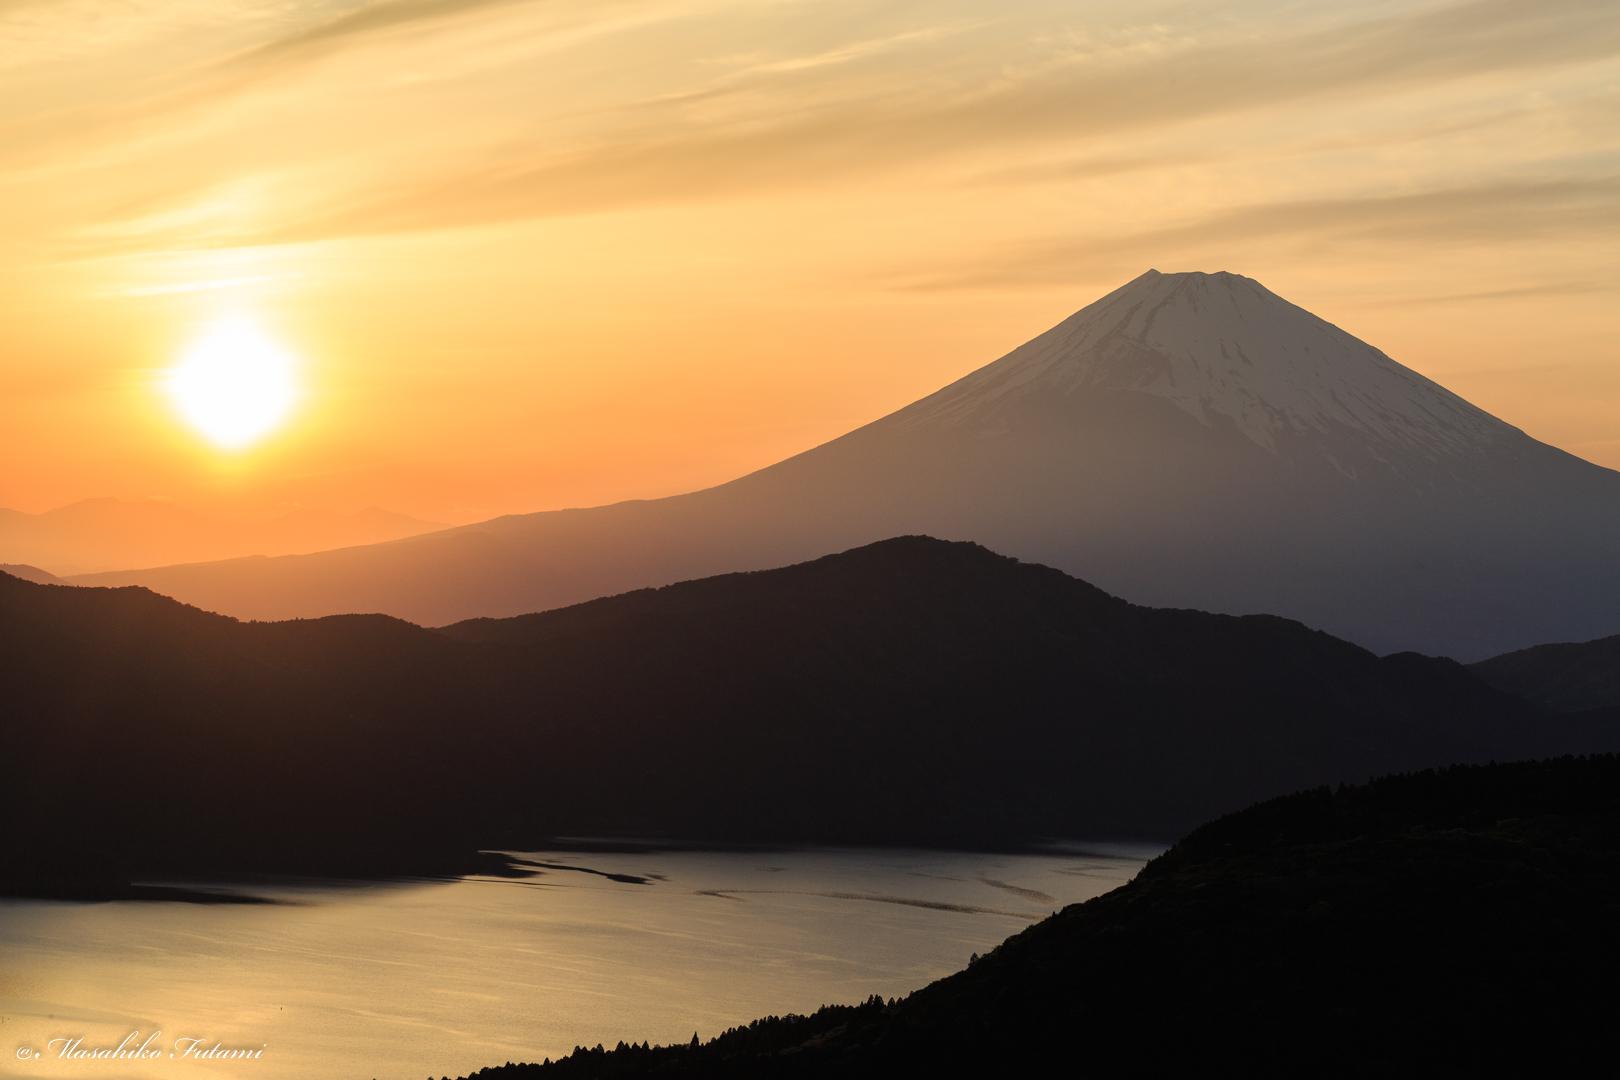 Sunset at Mt. Fuji